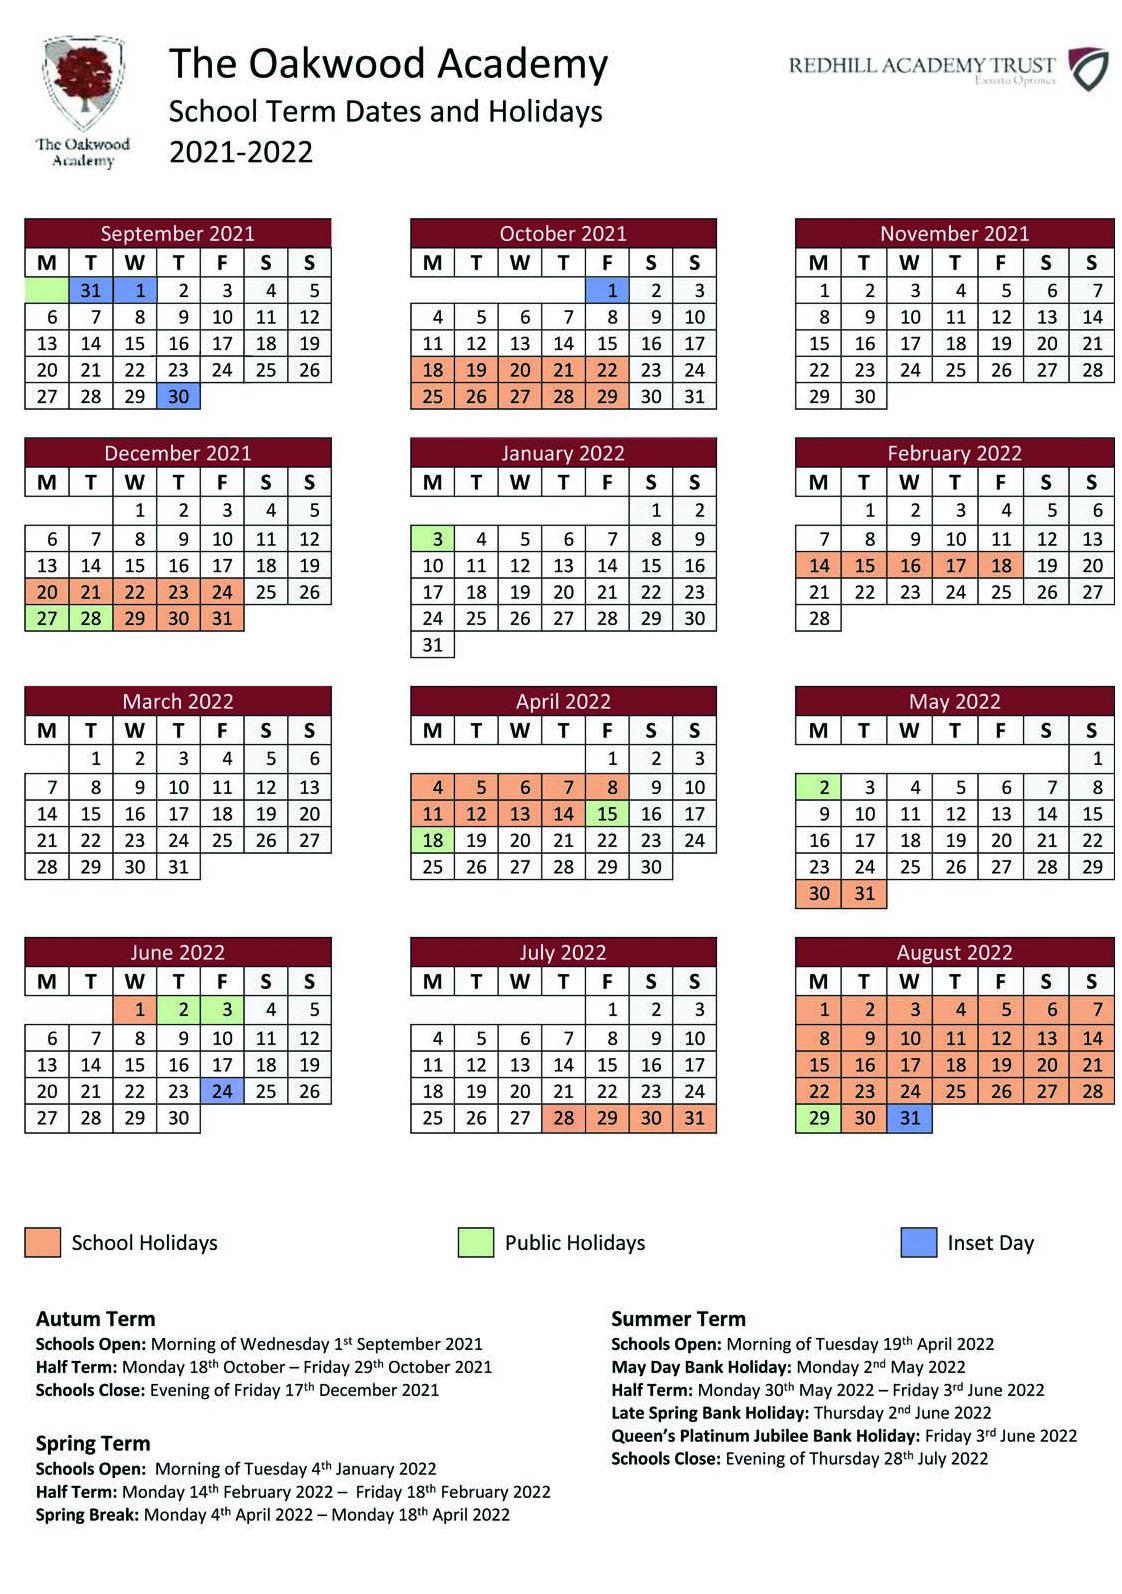 The Oakwood Academy term dates